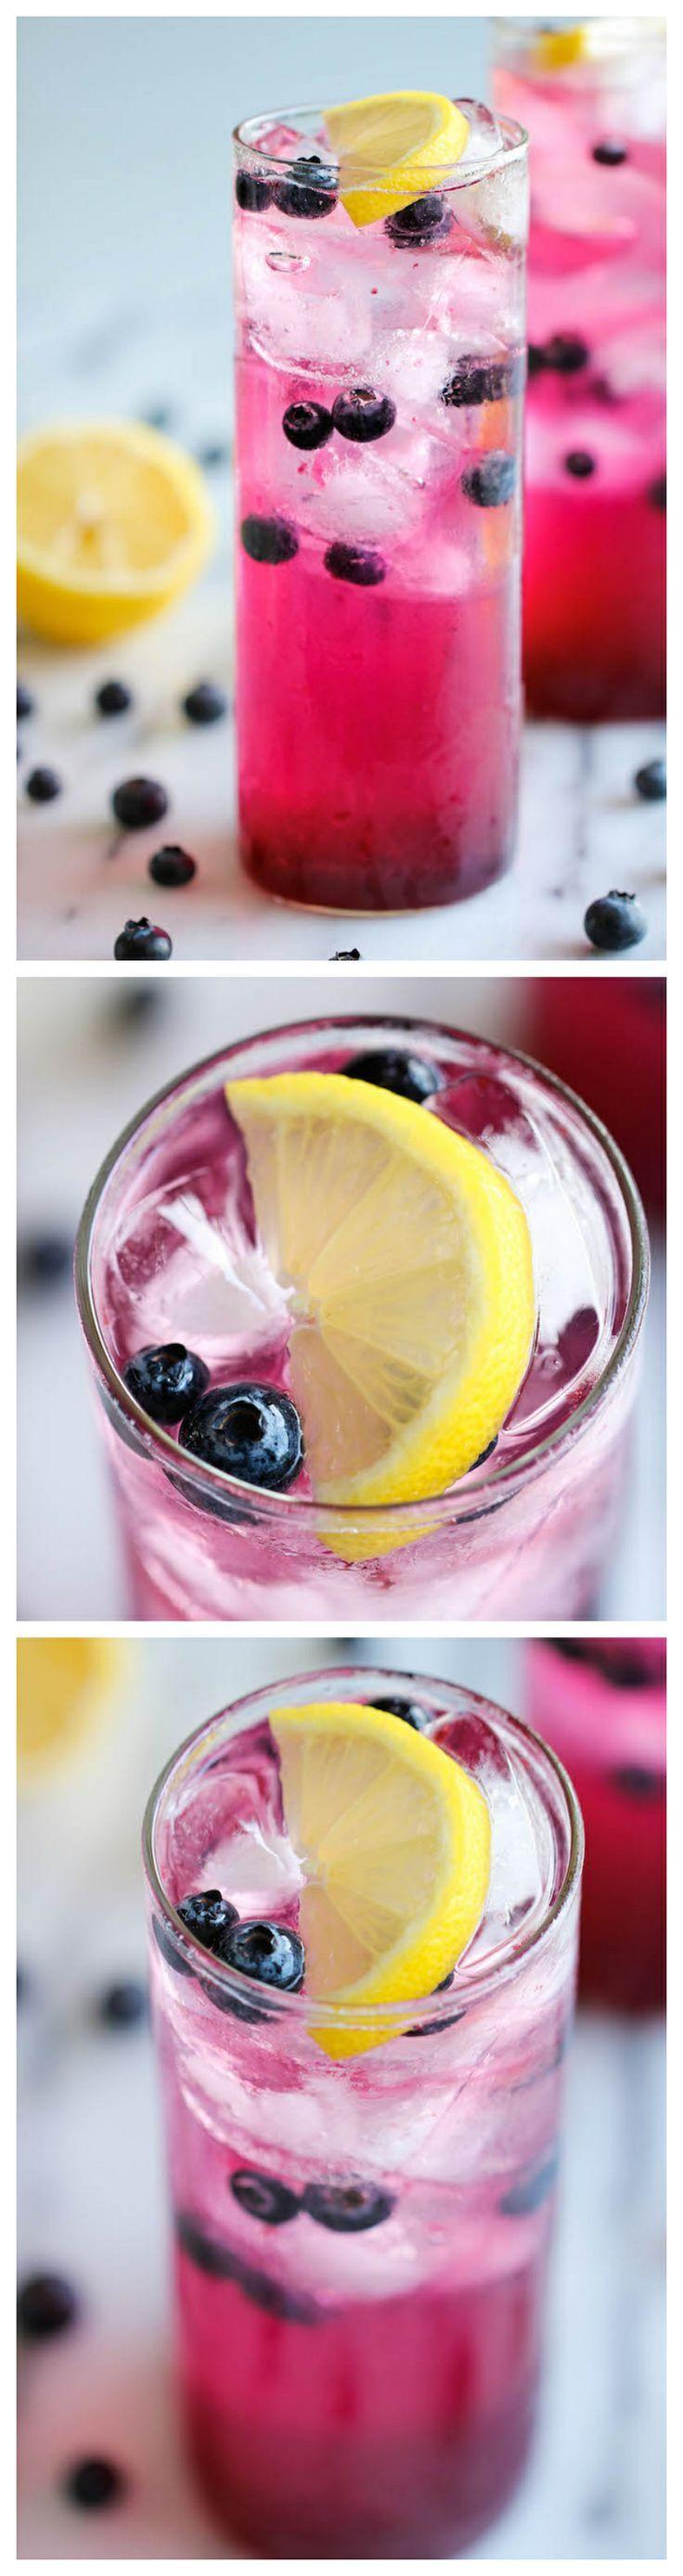 Blueberry Lemonade #lemonade #recipe #spring